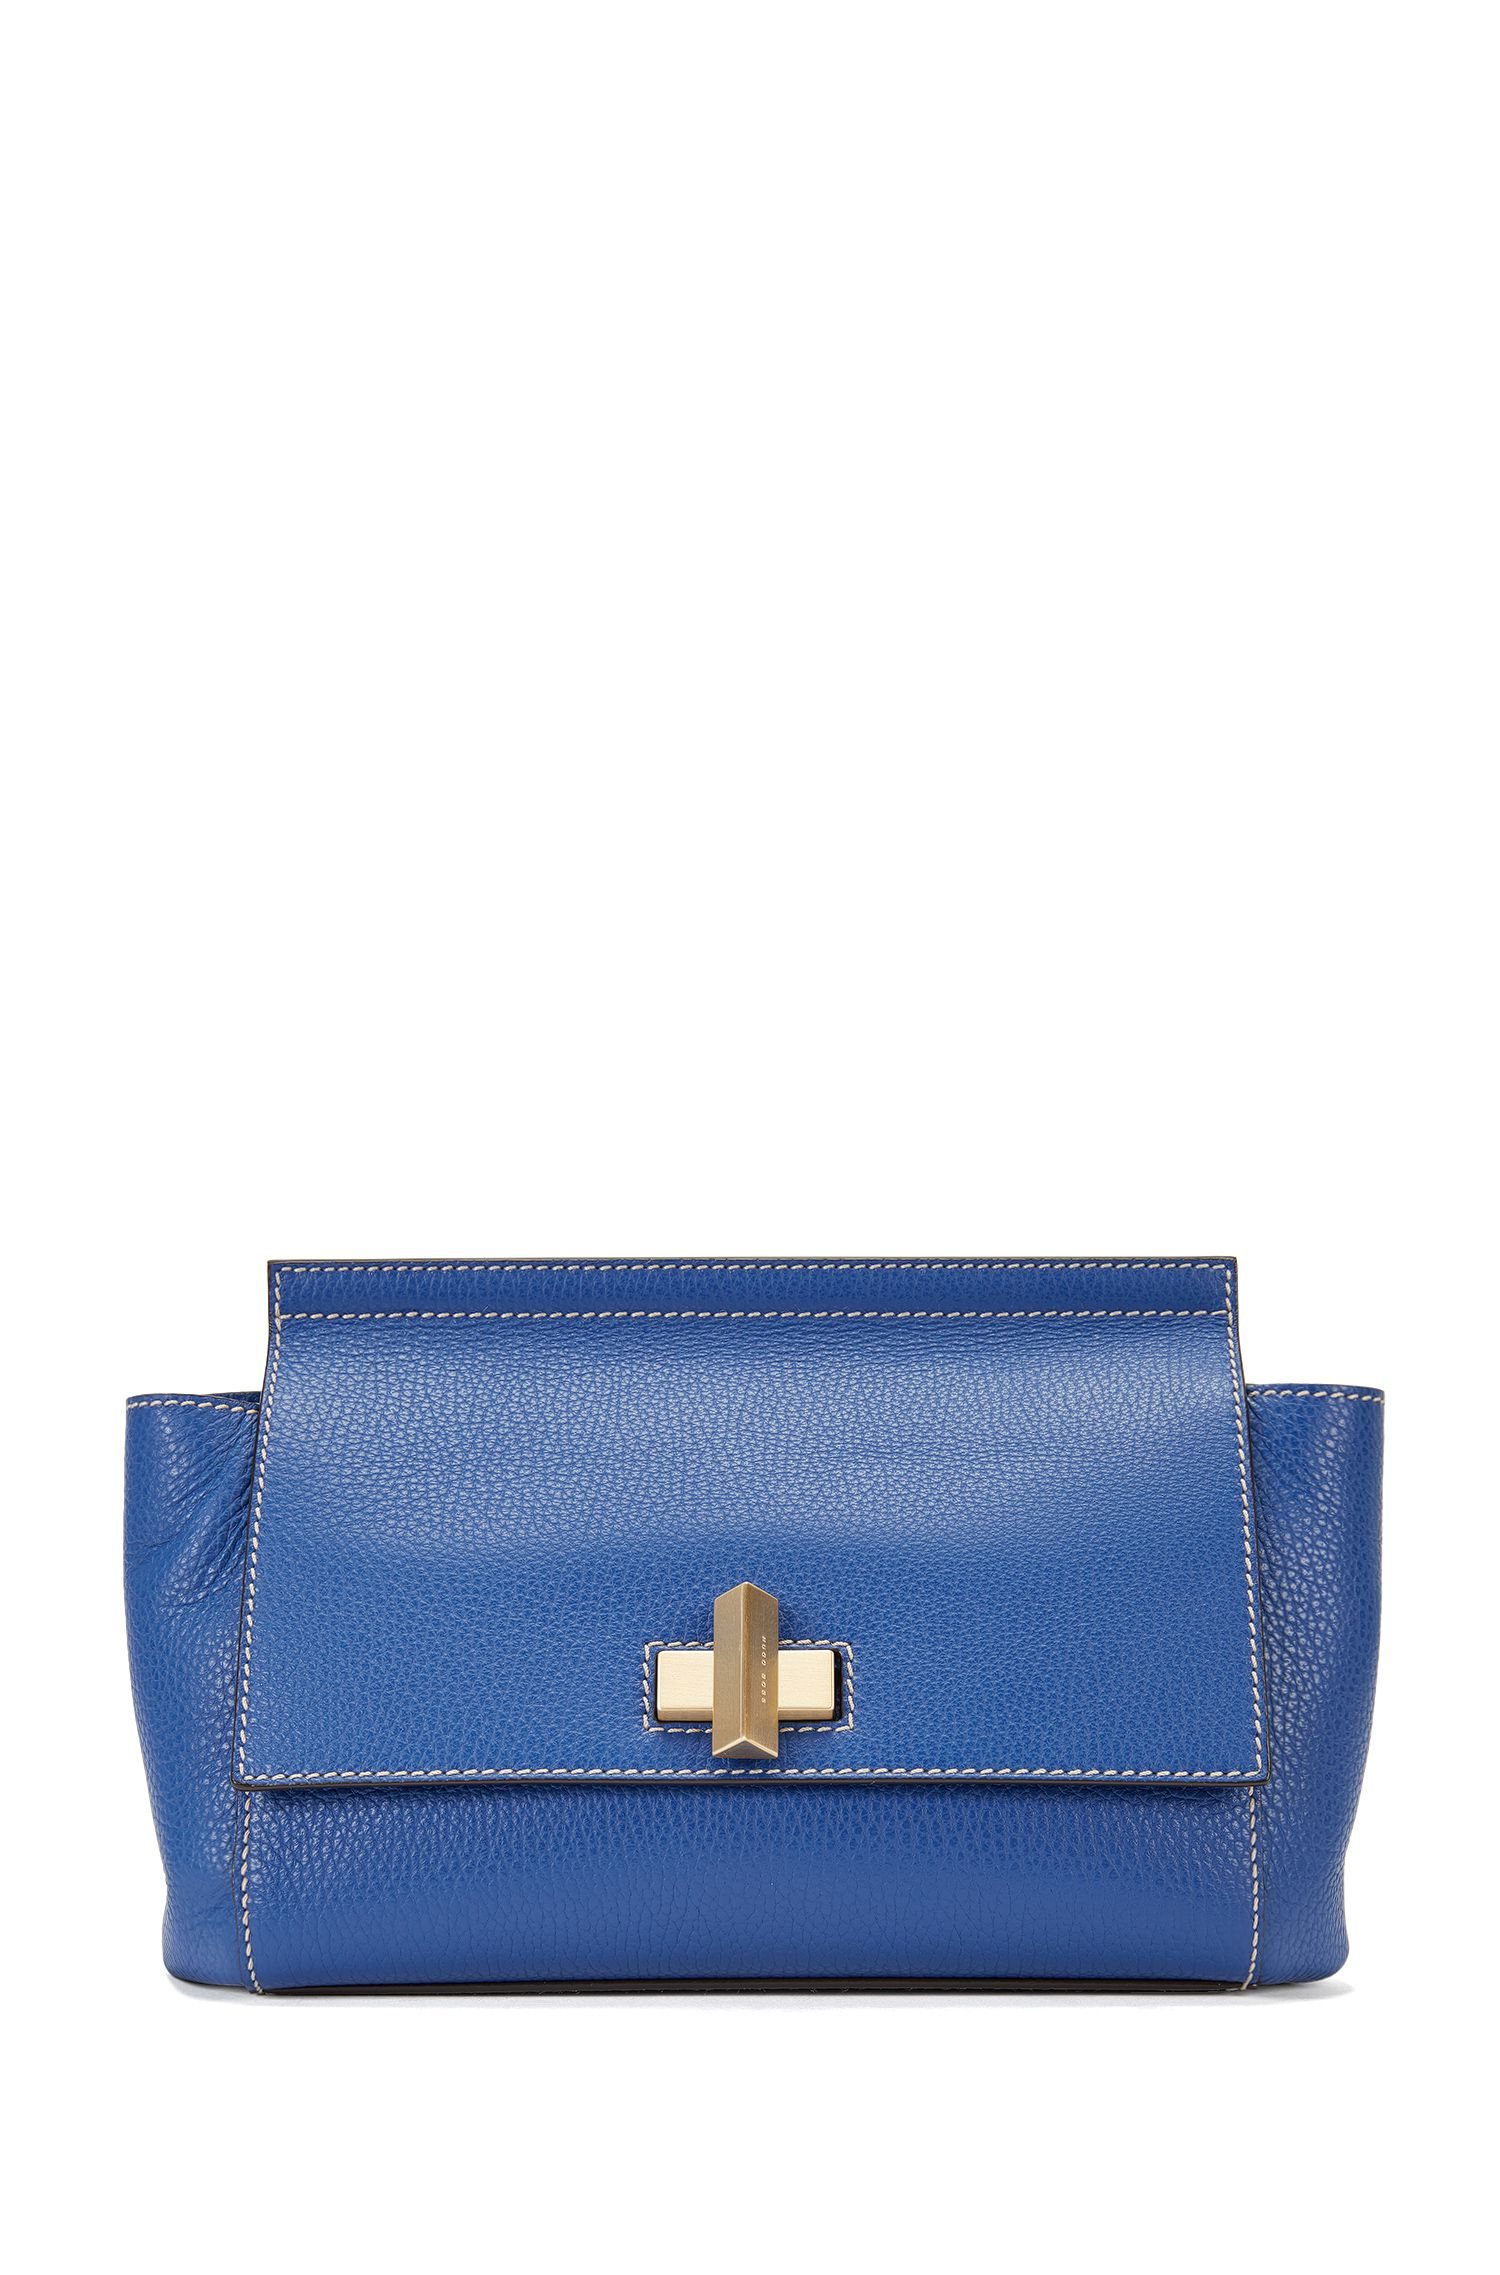 BOSS Bespoke shoulder bag in textured leather: 'BOSS Bespoke Soft C.'